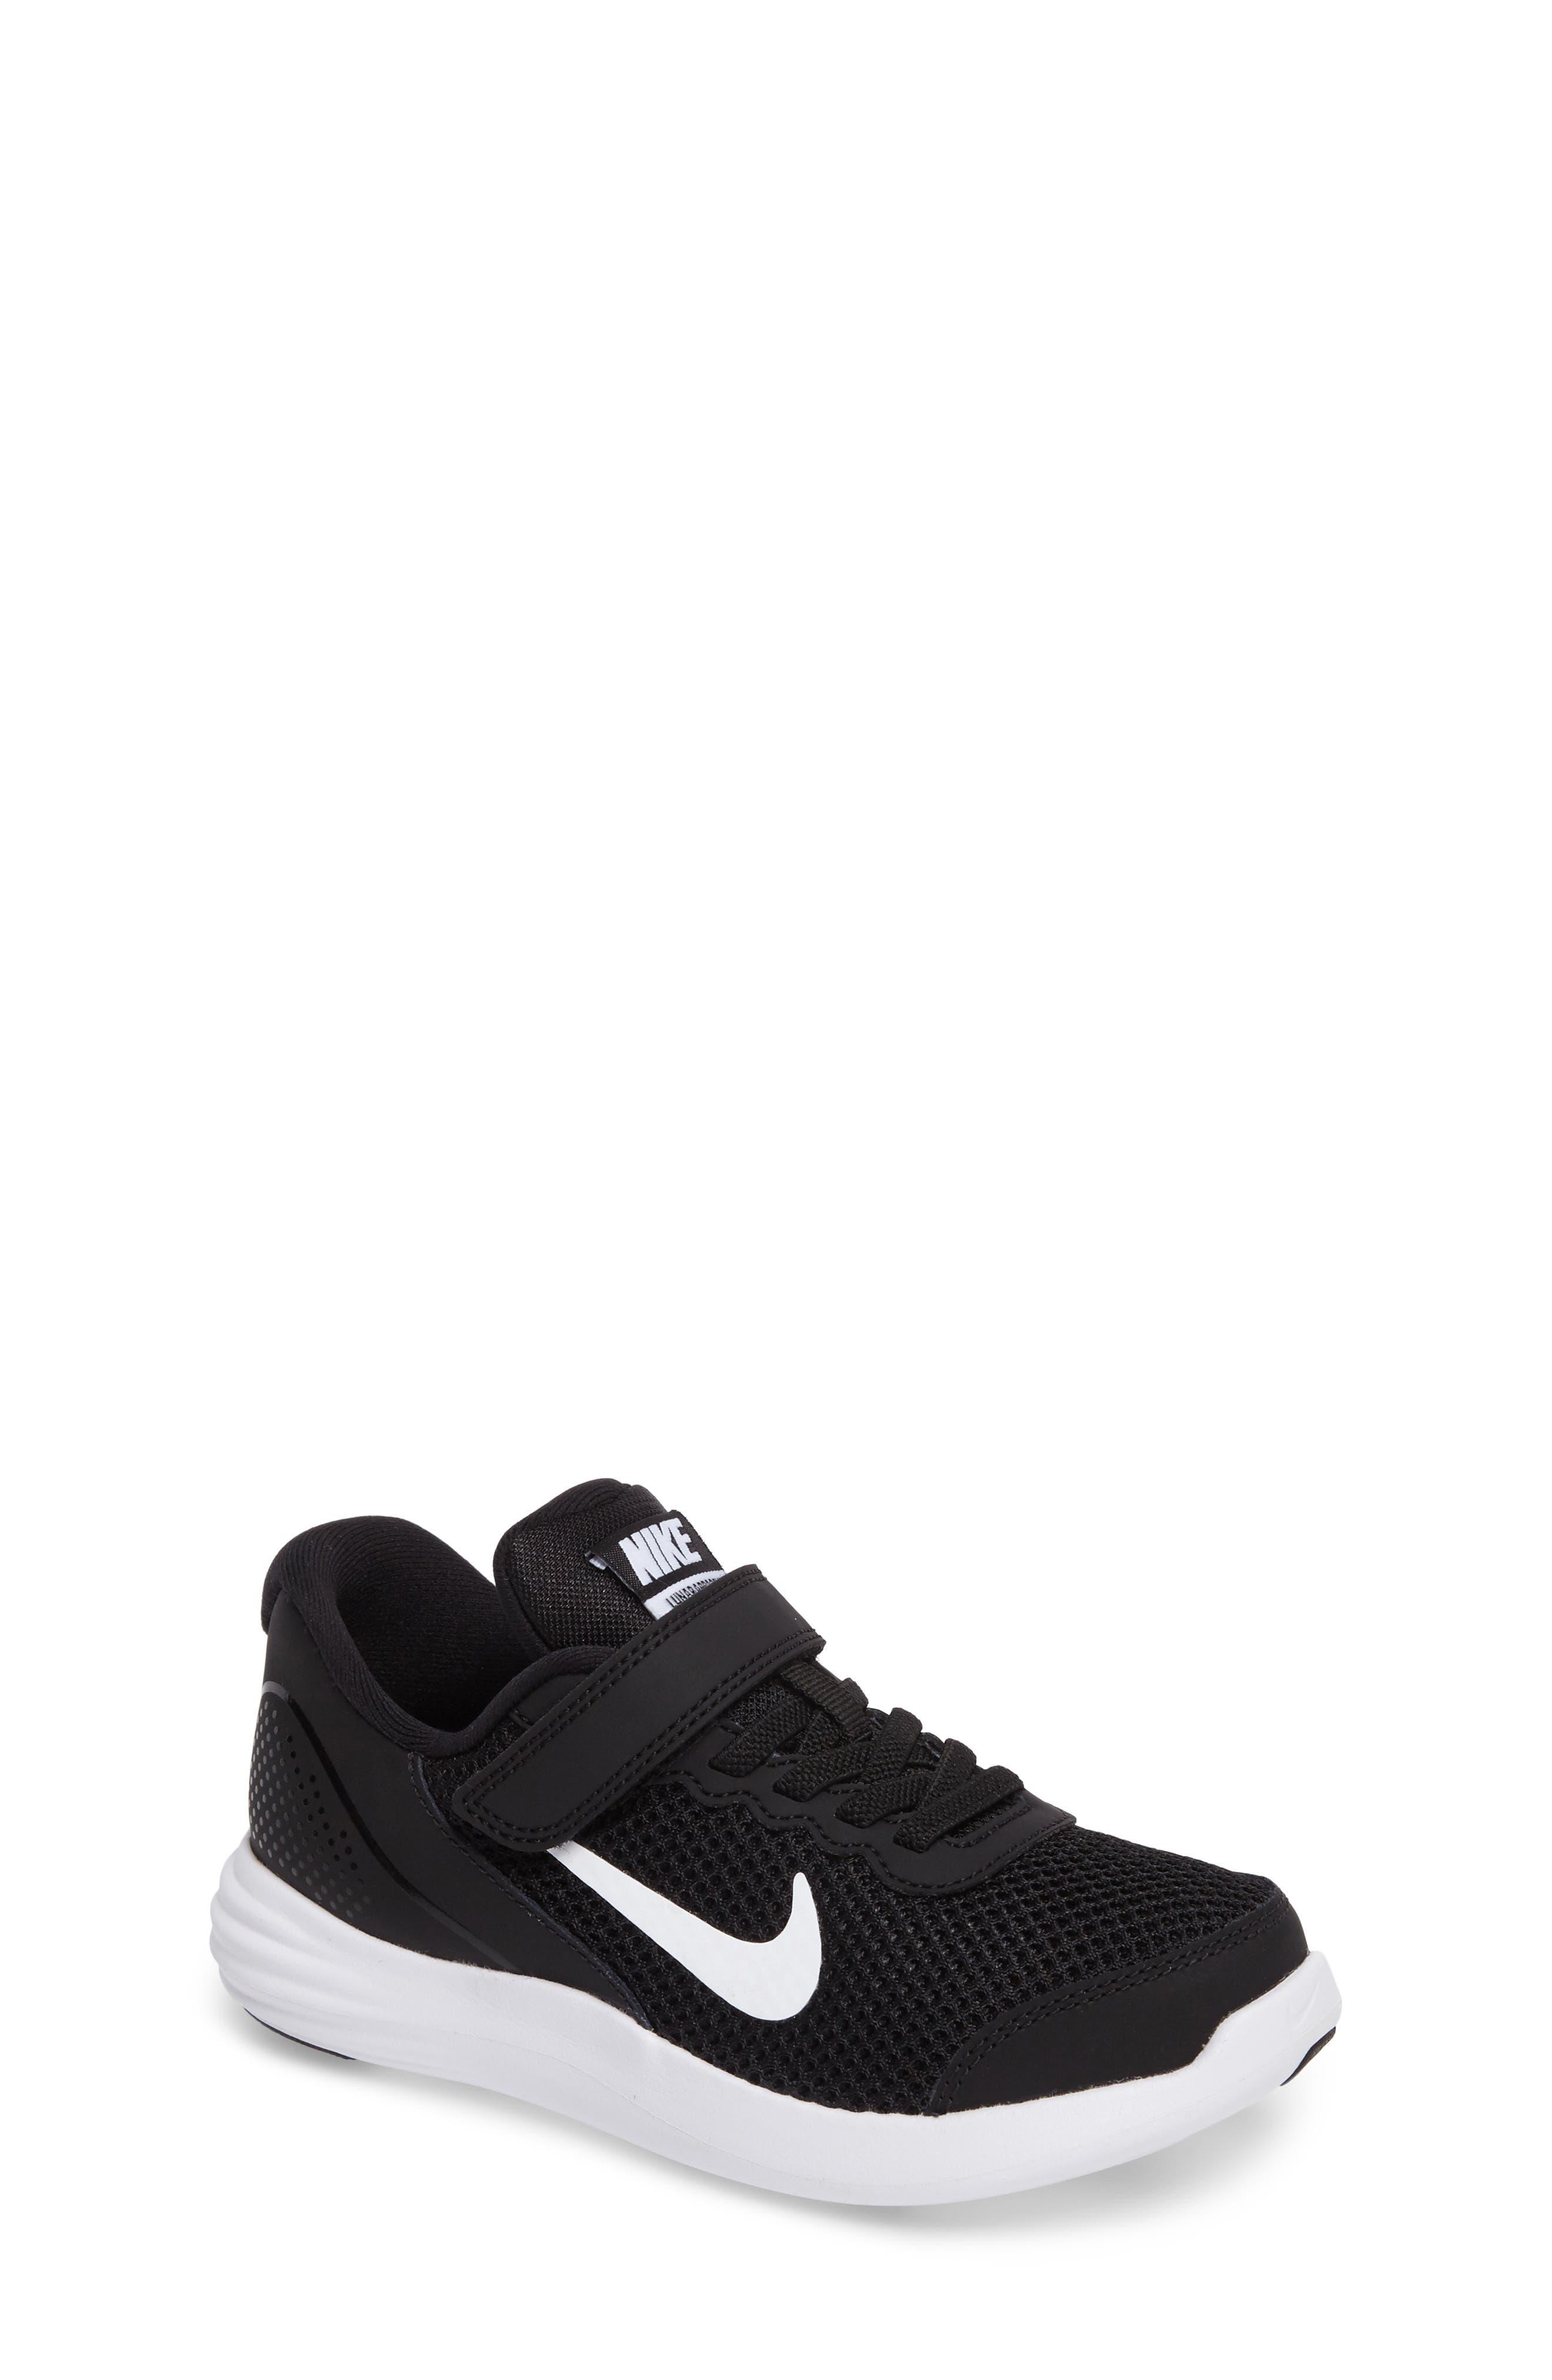 Lunar Apparent Sneaker,                         Main,                         color, 004